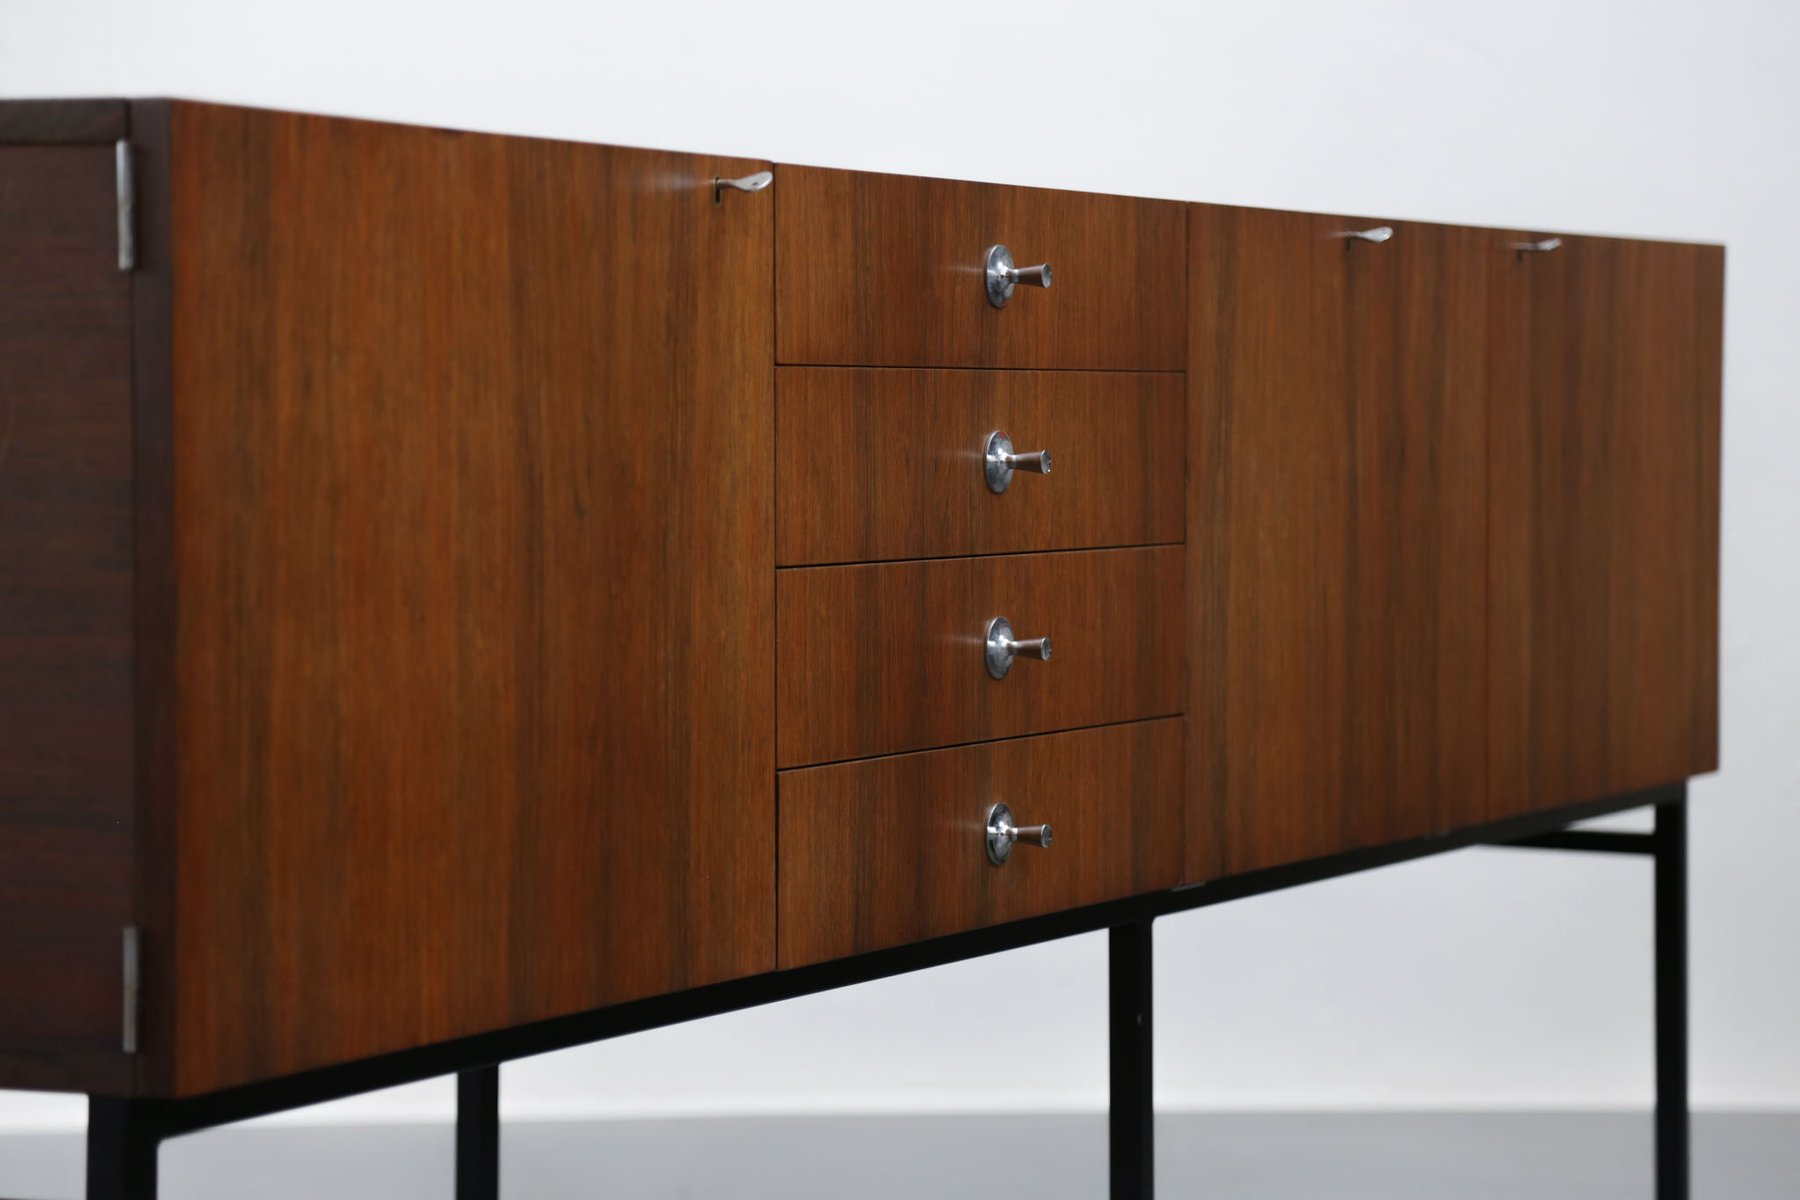 vintage french sideboard by alain richard for meubles tv for sale at pamono. Black Bedroom Furniture Sets. Home Design Ideas